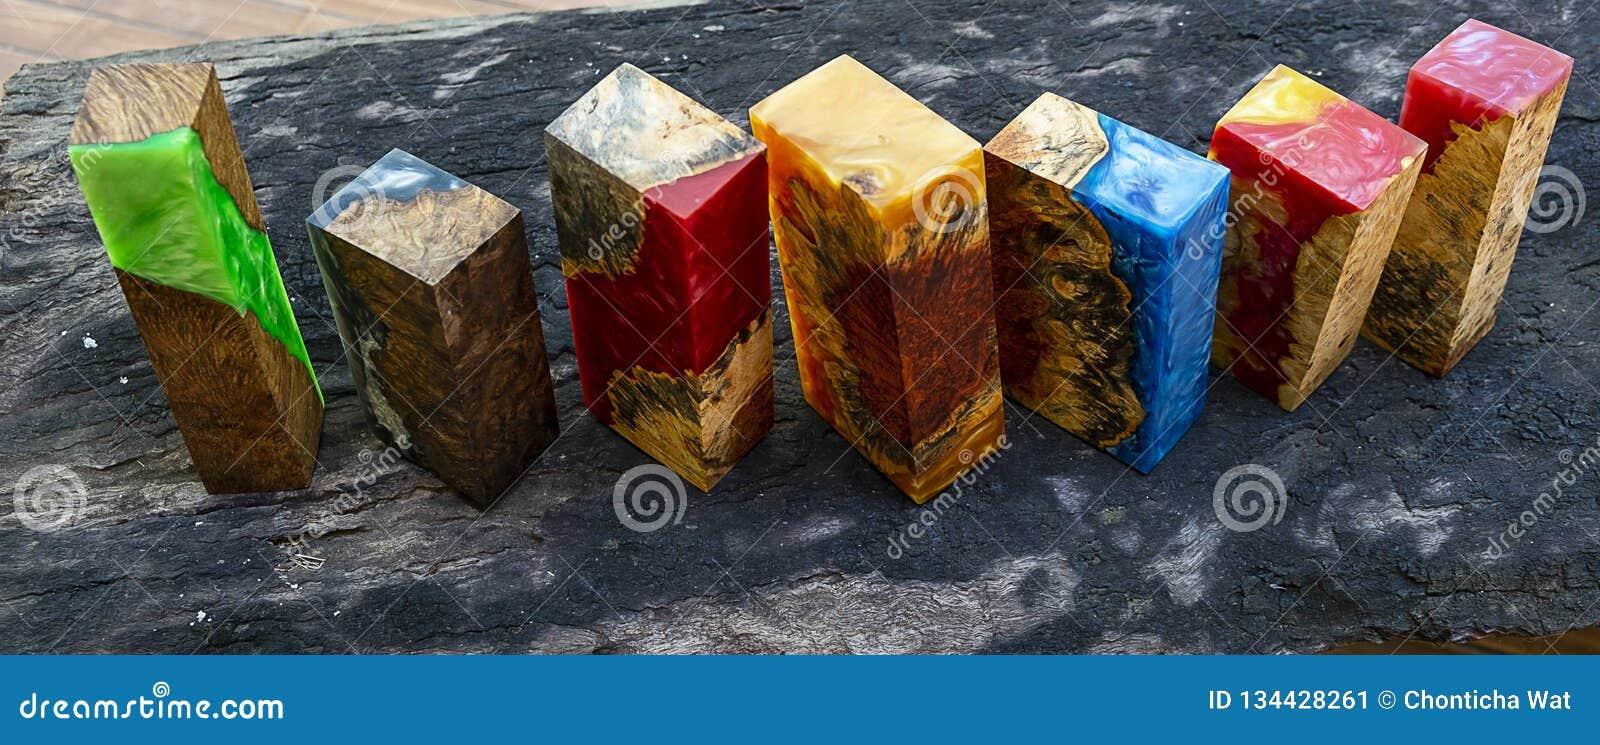 Epoxy Resin Stabilizing Afzelia Burl Exotic Wood Yellow Background